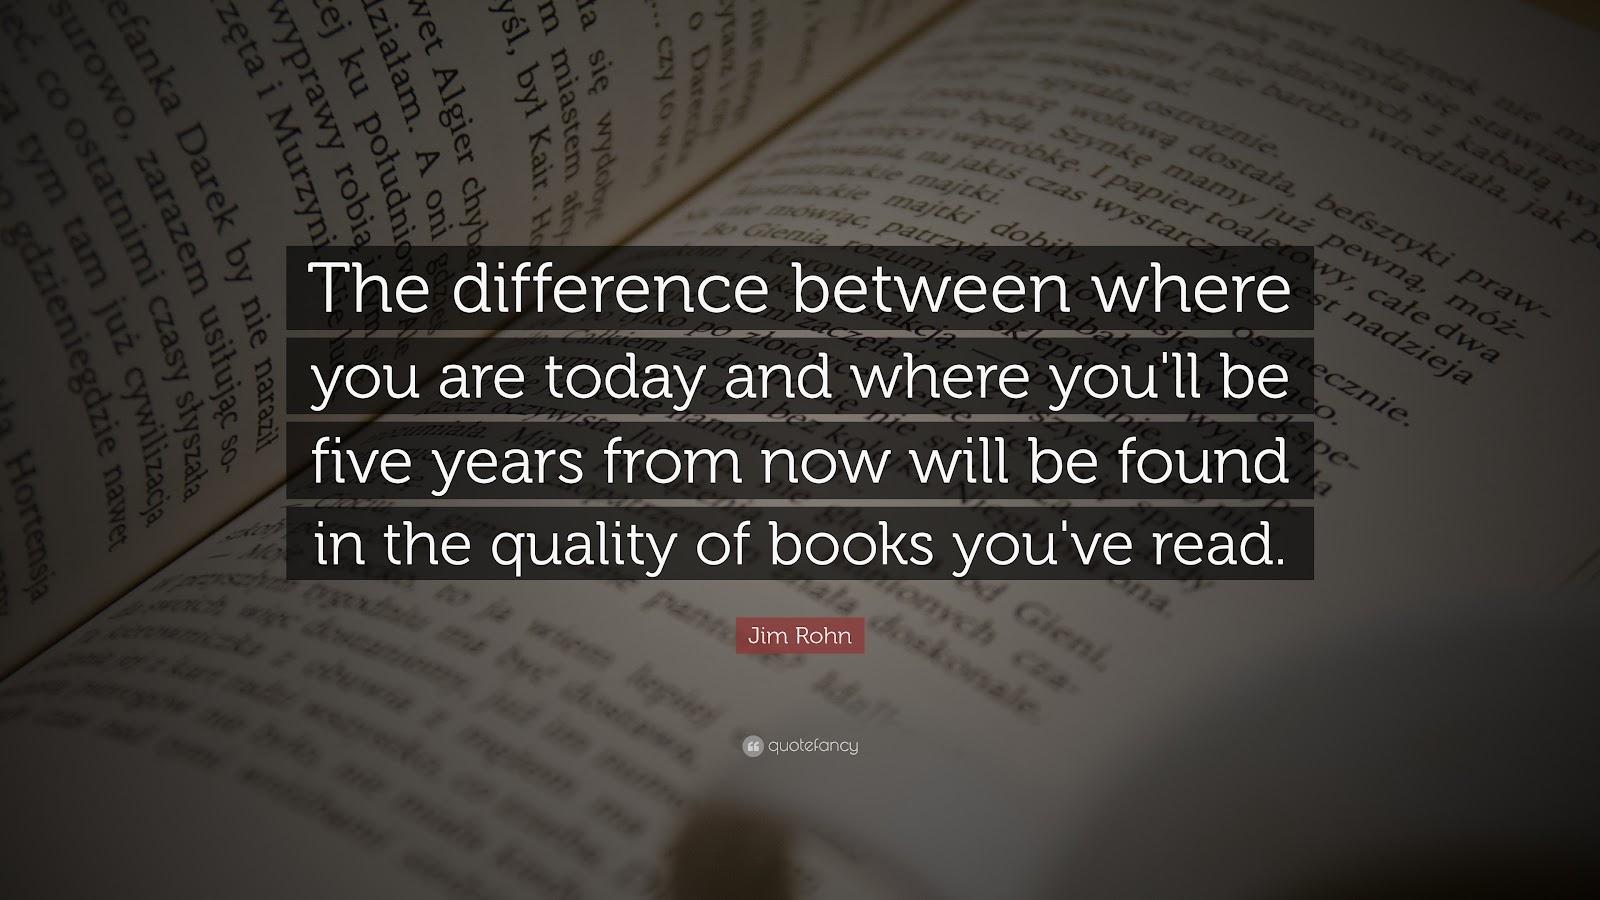 Jim Rohn - learning quote.jpg